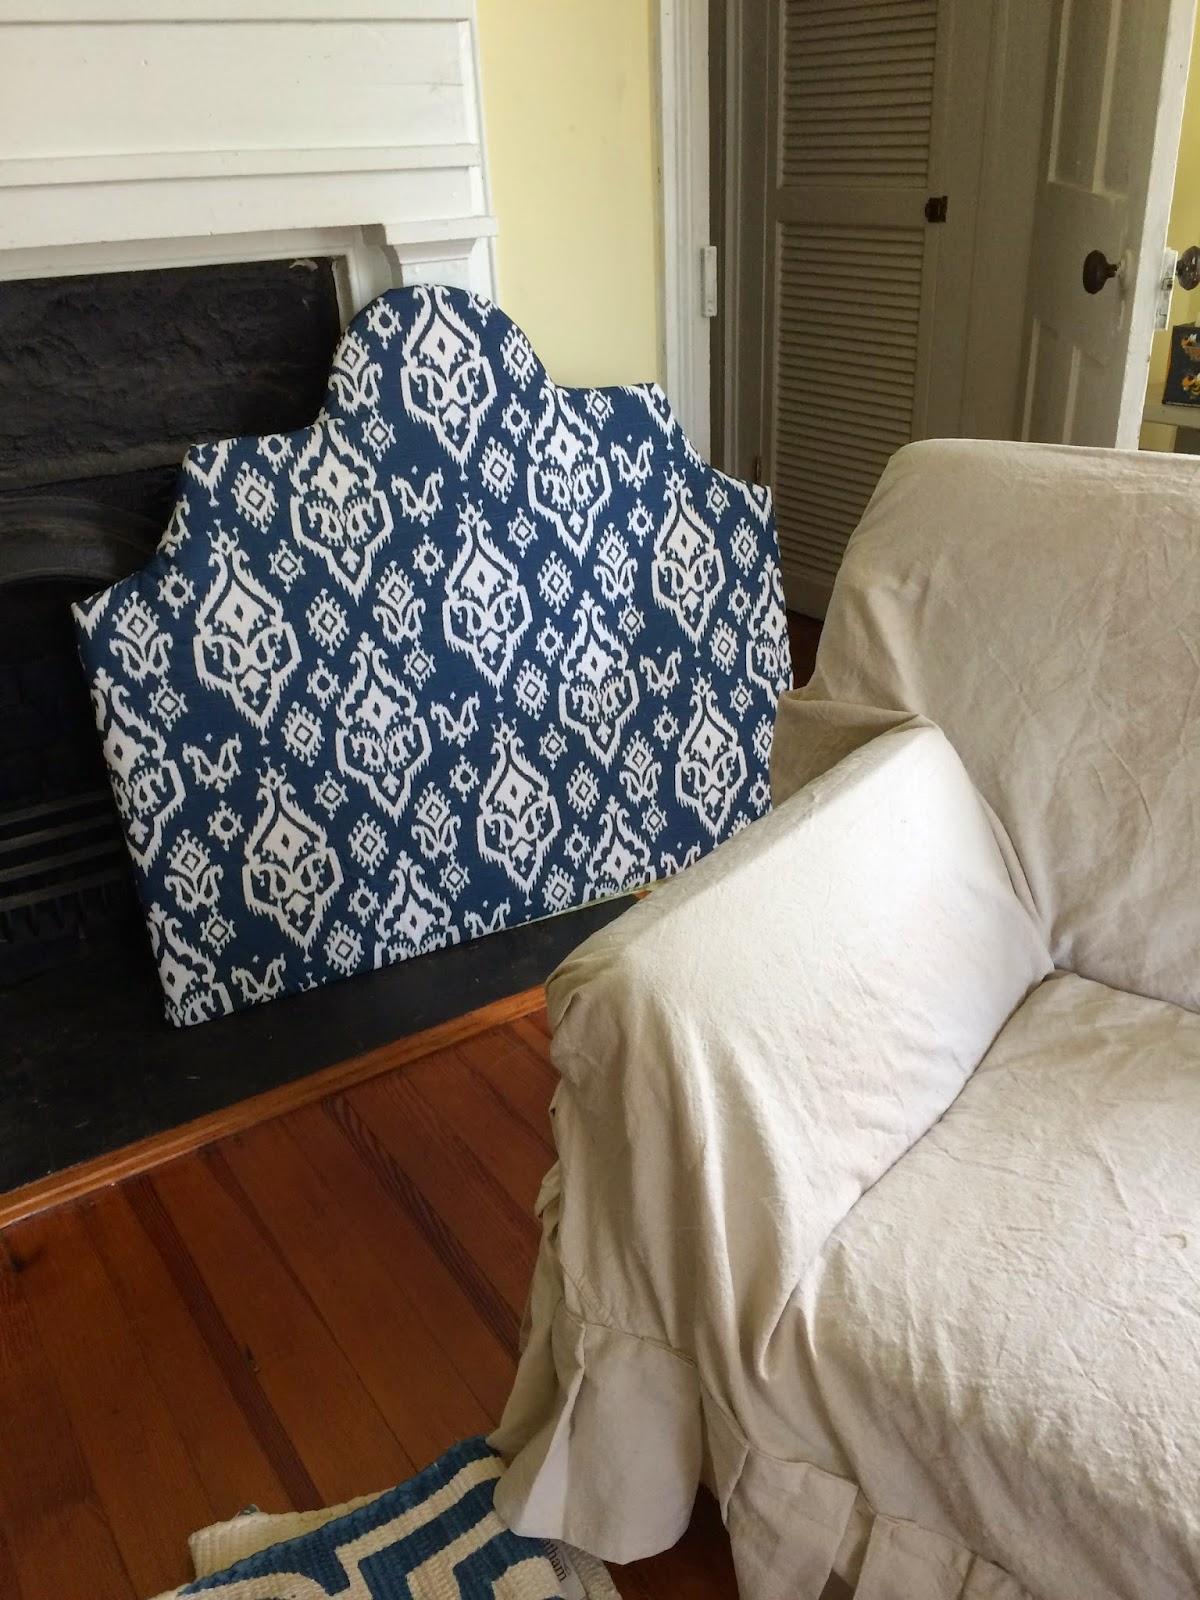 Dorm Room Headboards: The Old Post Road: Dorm Room Details Year 4